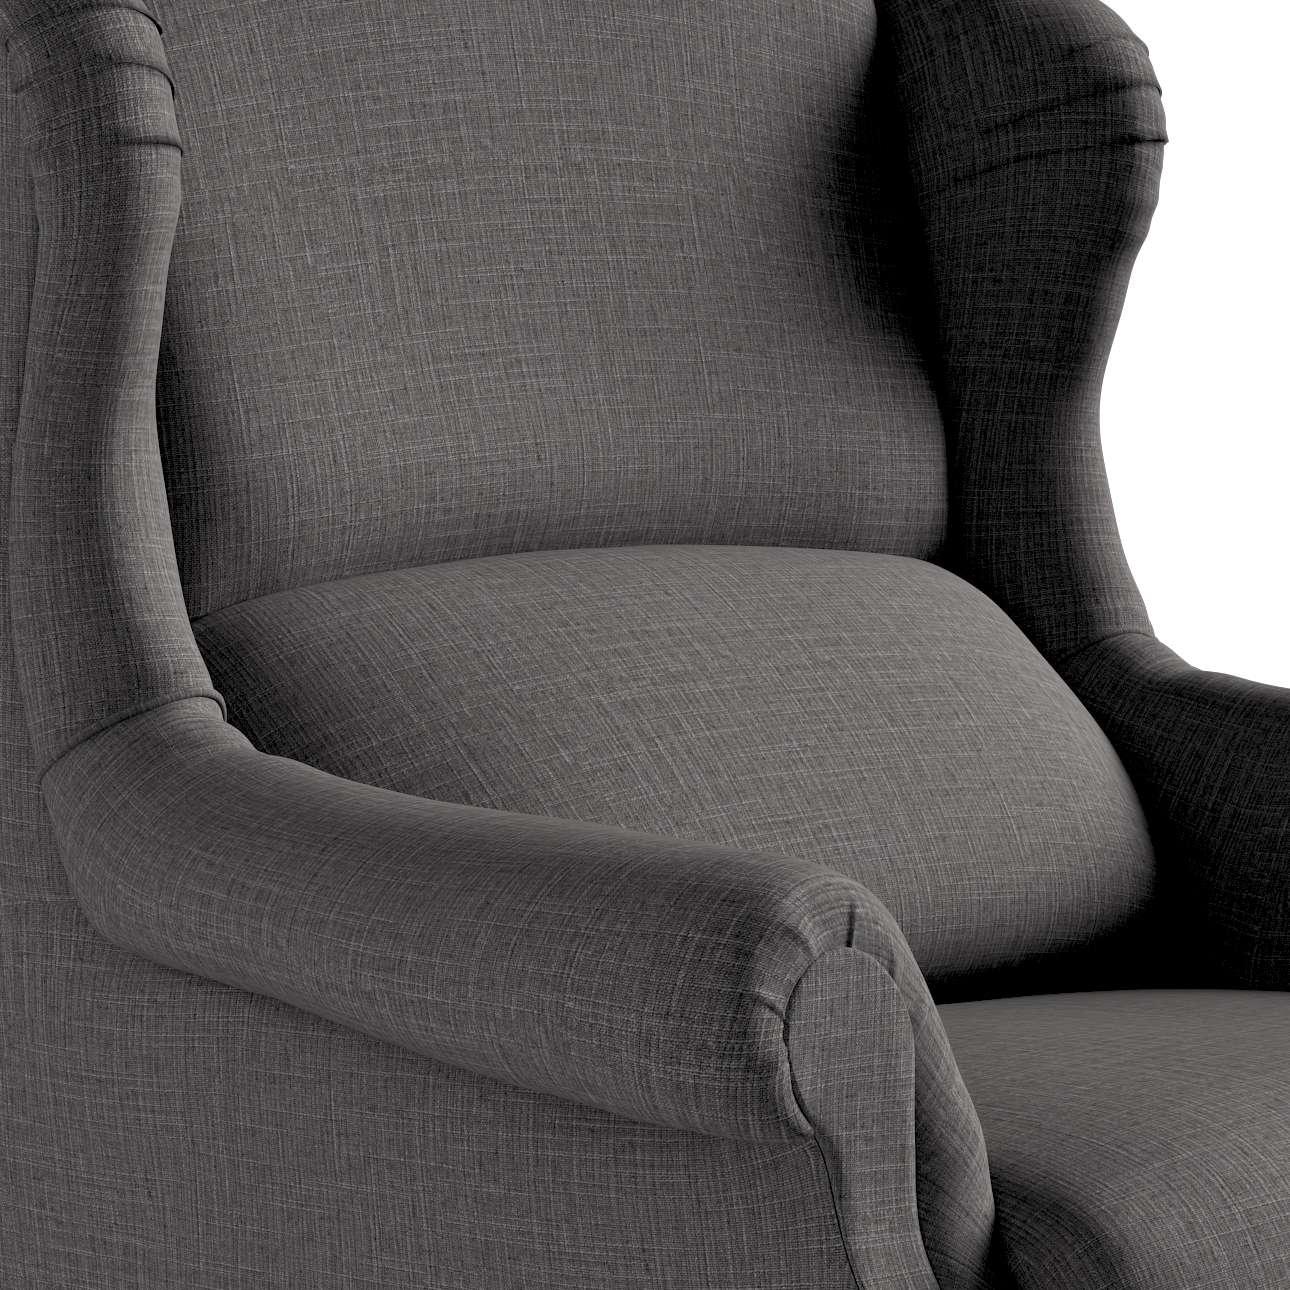 Fotel Unique w kolekcji Living II, tkanina: 161-16